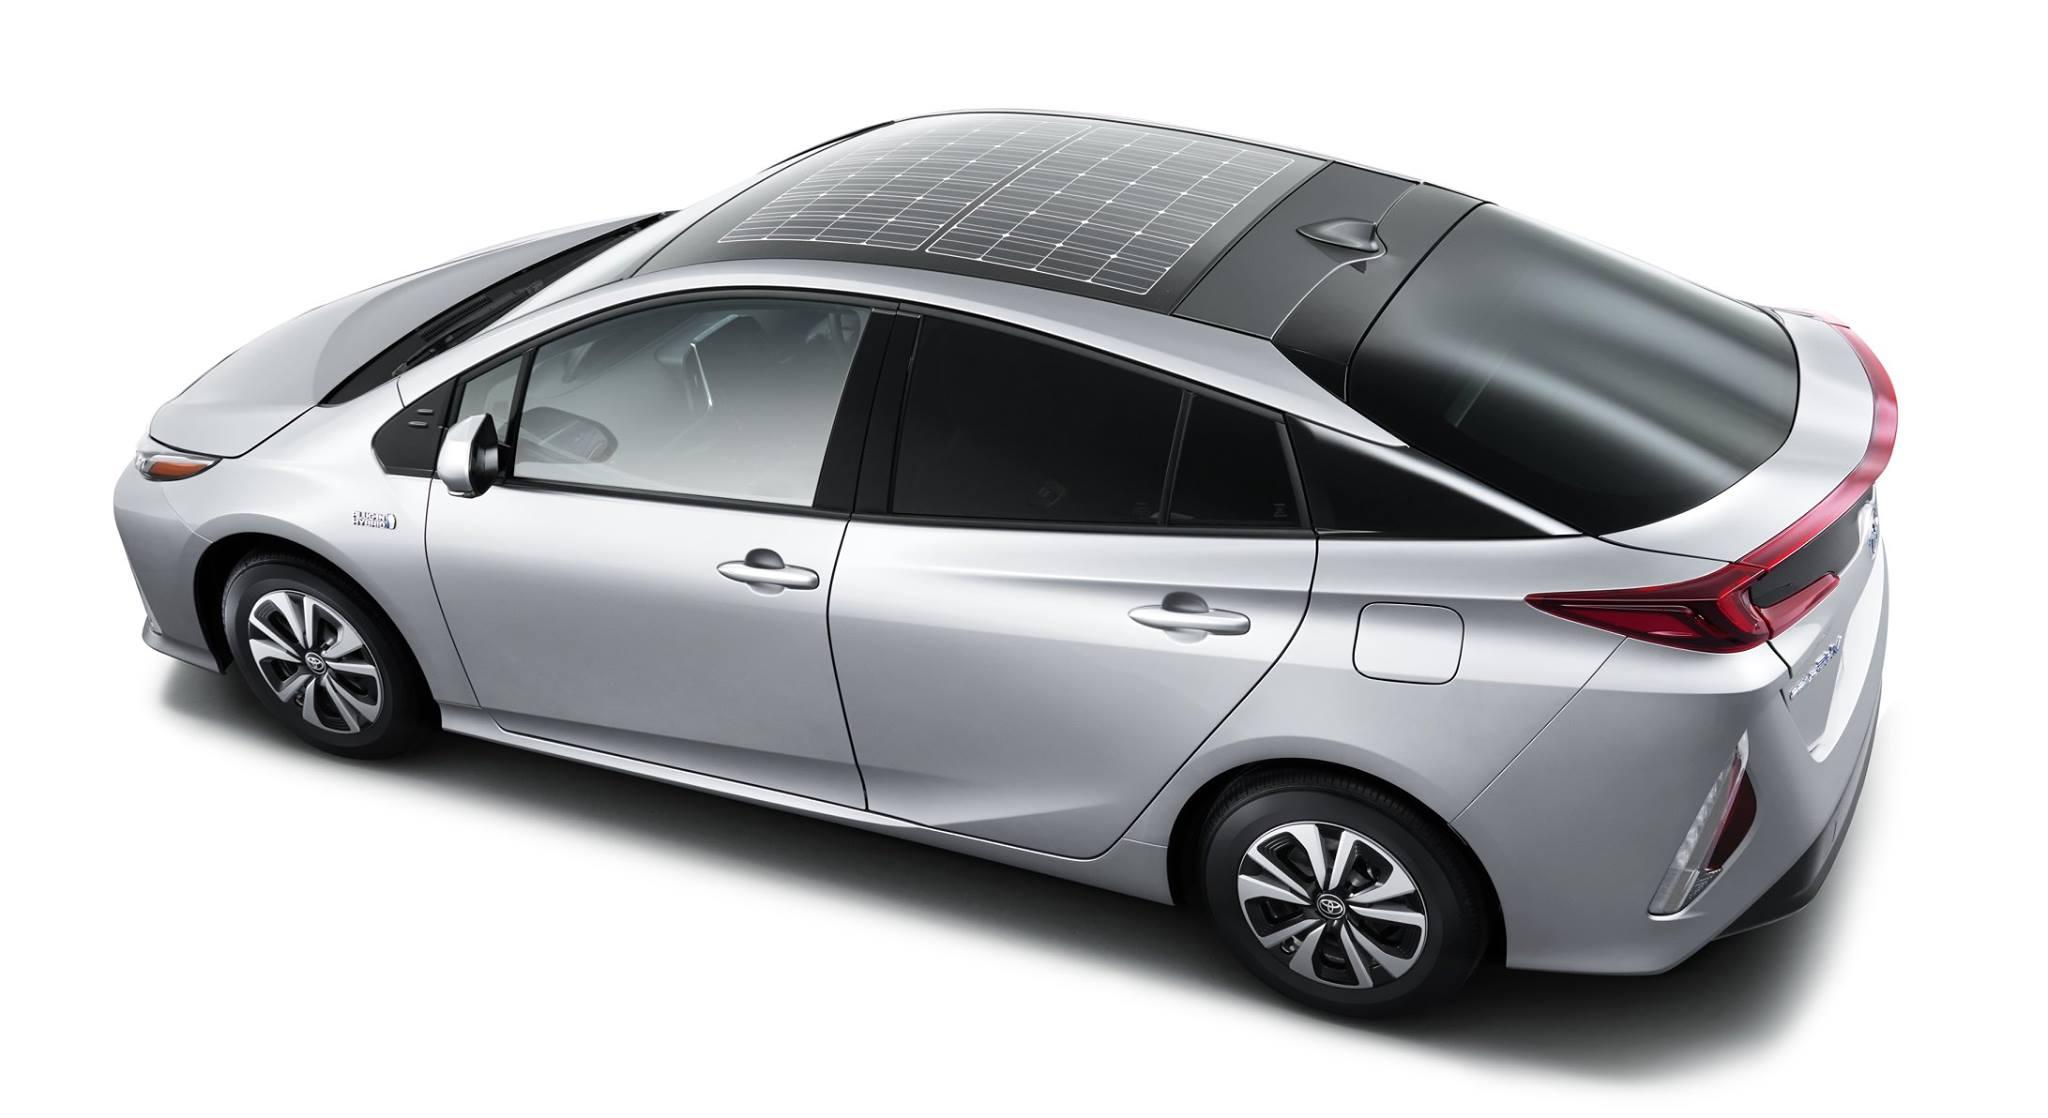 Quel sera le prix de Prius 4 rechargeable en Europe?